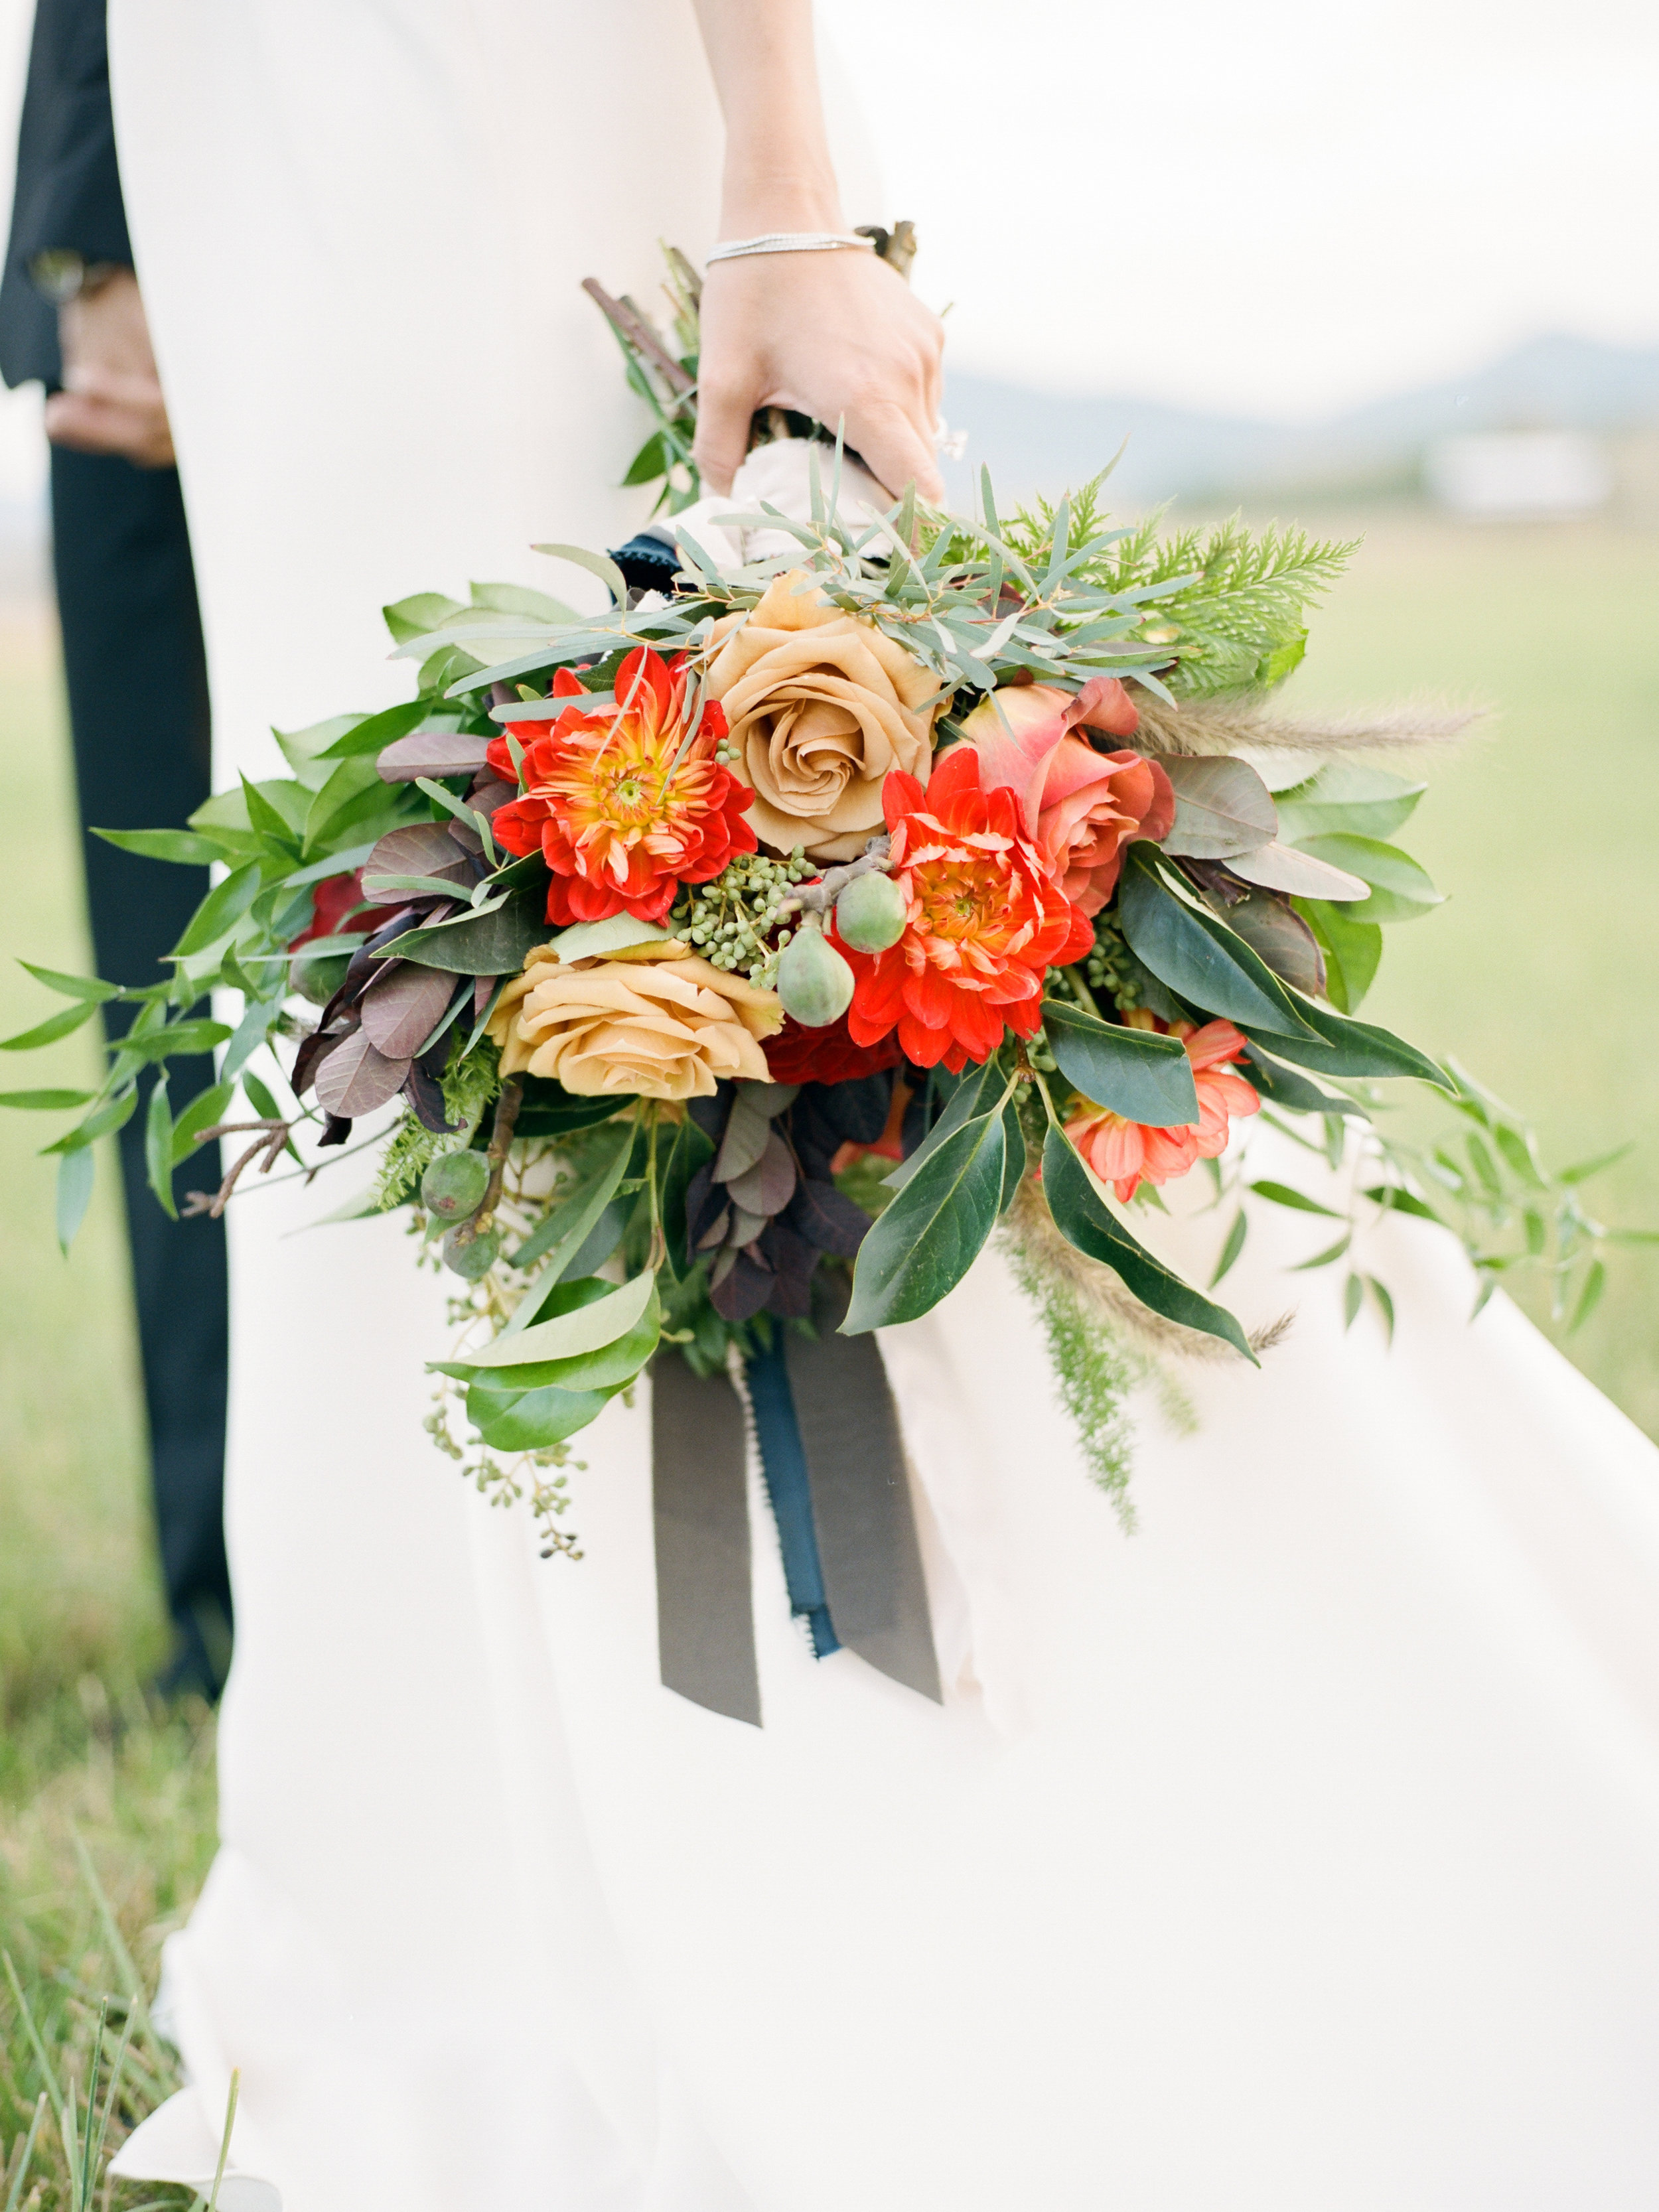 Bozeman-Big Sky-Montana-wedding-engagement-family-photographer-0148.jpg